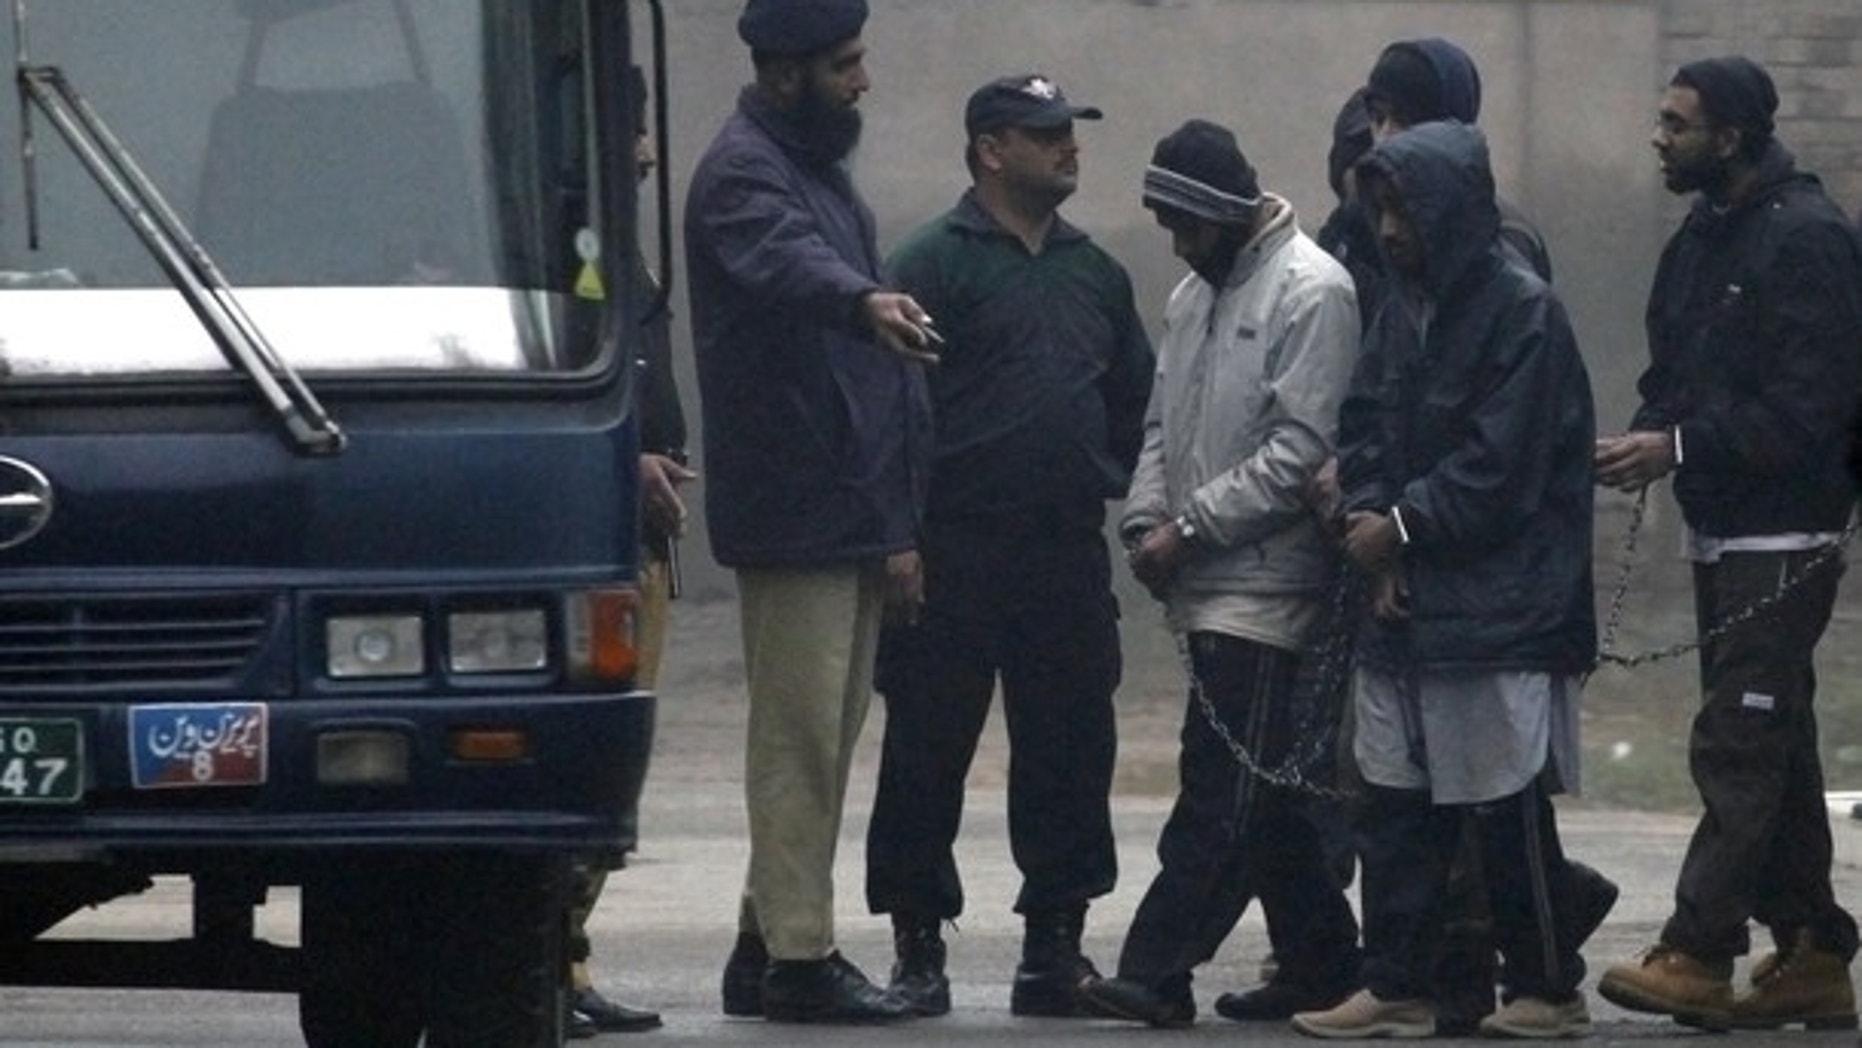 Jan. 18: Pakistani police escort five Americans held on terror charges in Punjab province, Pakistan.